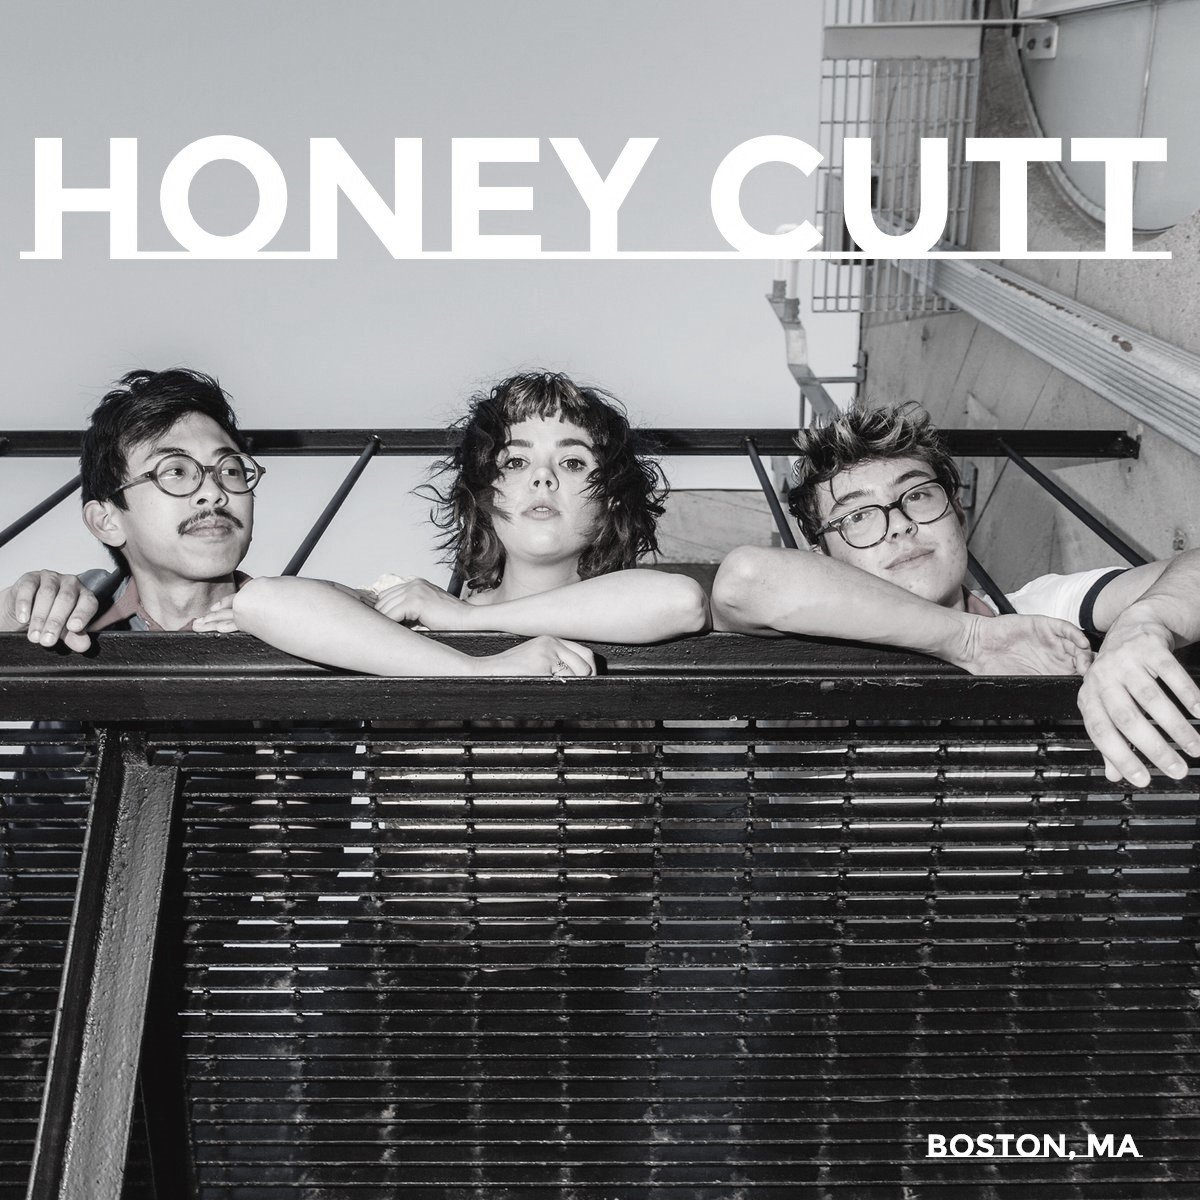 Check out: @HoneyCuttband   #surf #rock #pop   #indiemusic #Boston   Go: bit.ly/33u3WON   #SuburbanDream